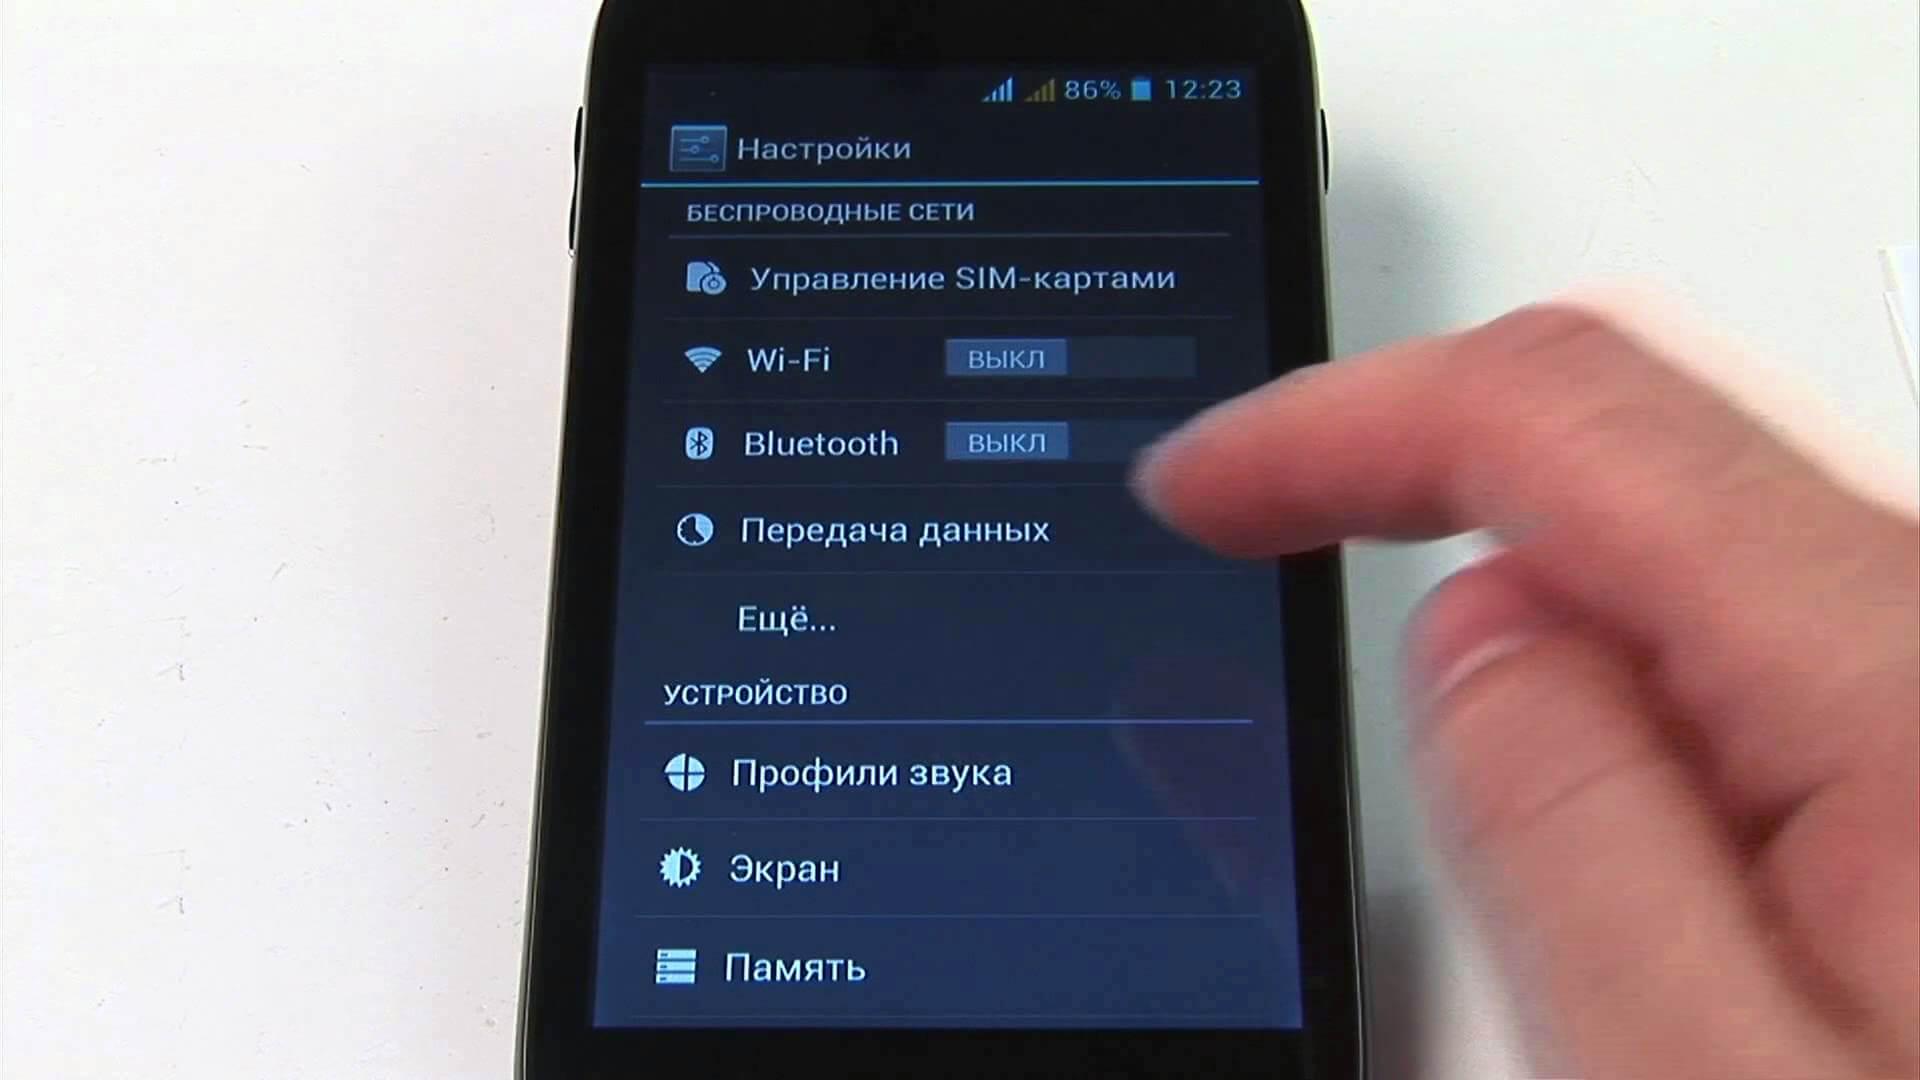 нет доступа в интернет на телефоне мегафон